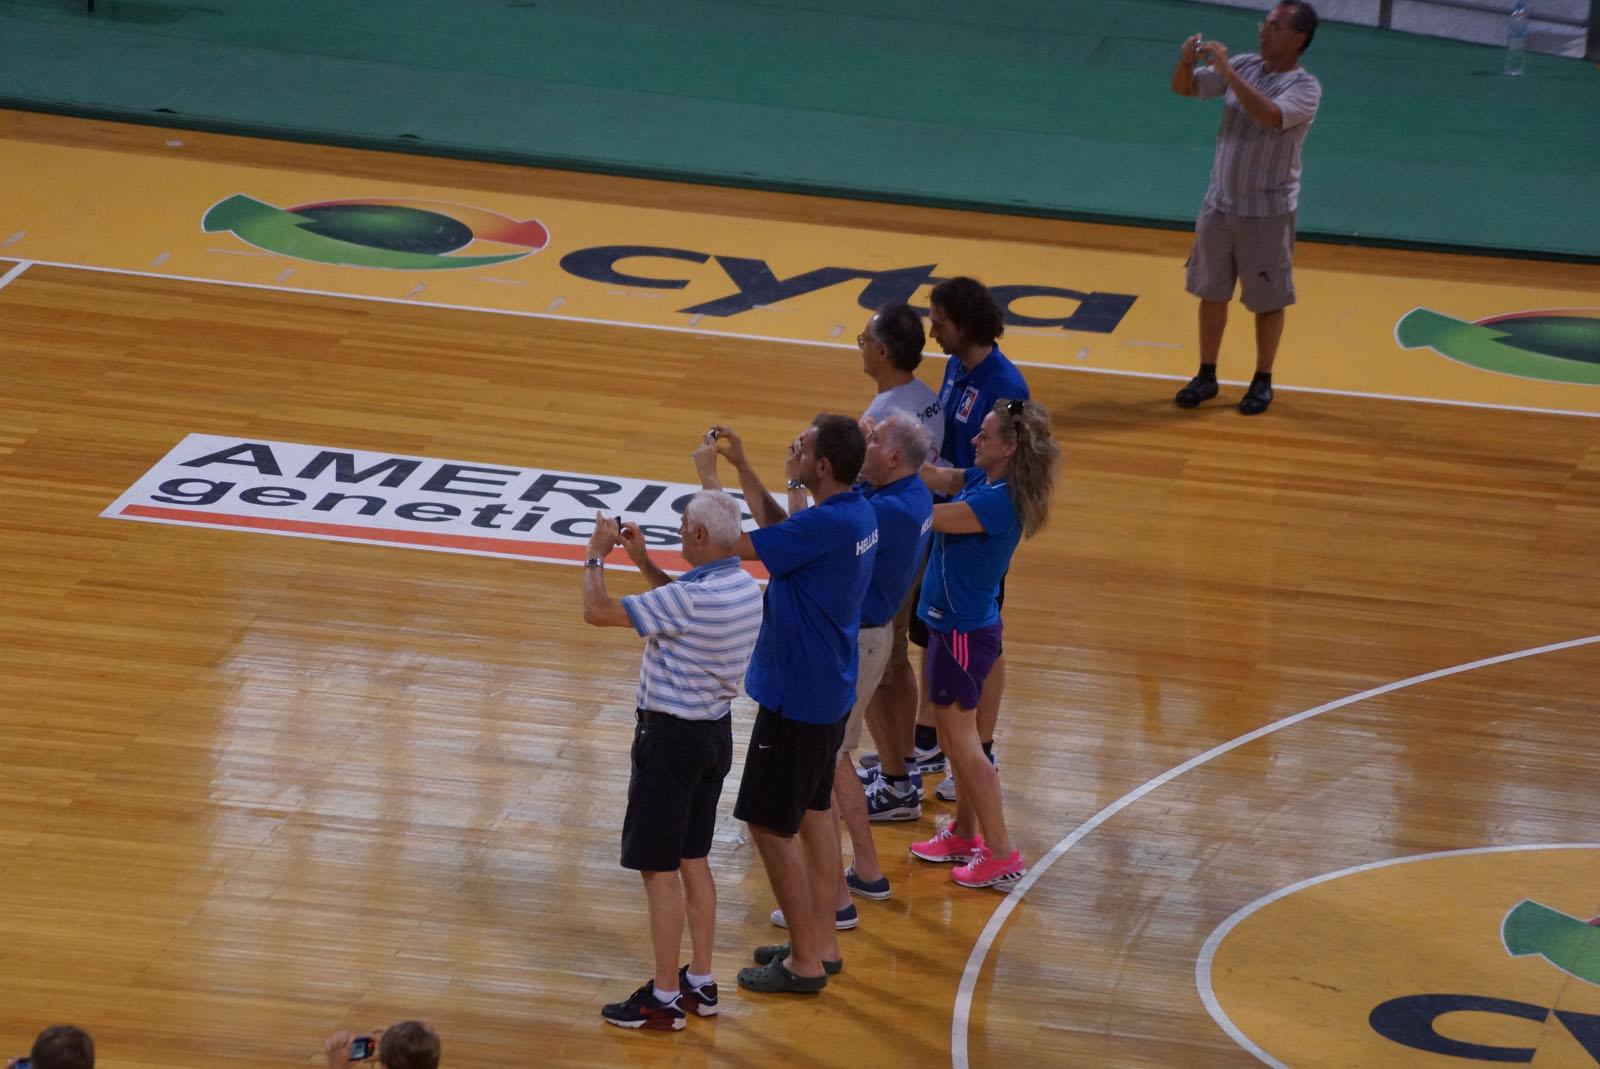 ALEXANDRION 1 | 50+M | SPAKE GREECE C - SWEDEN